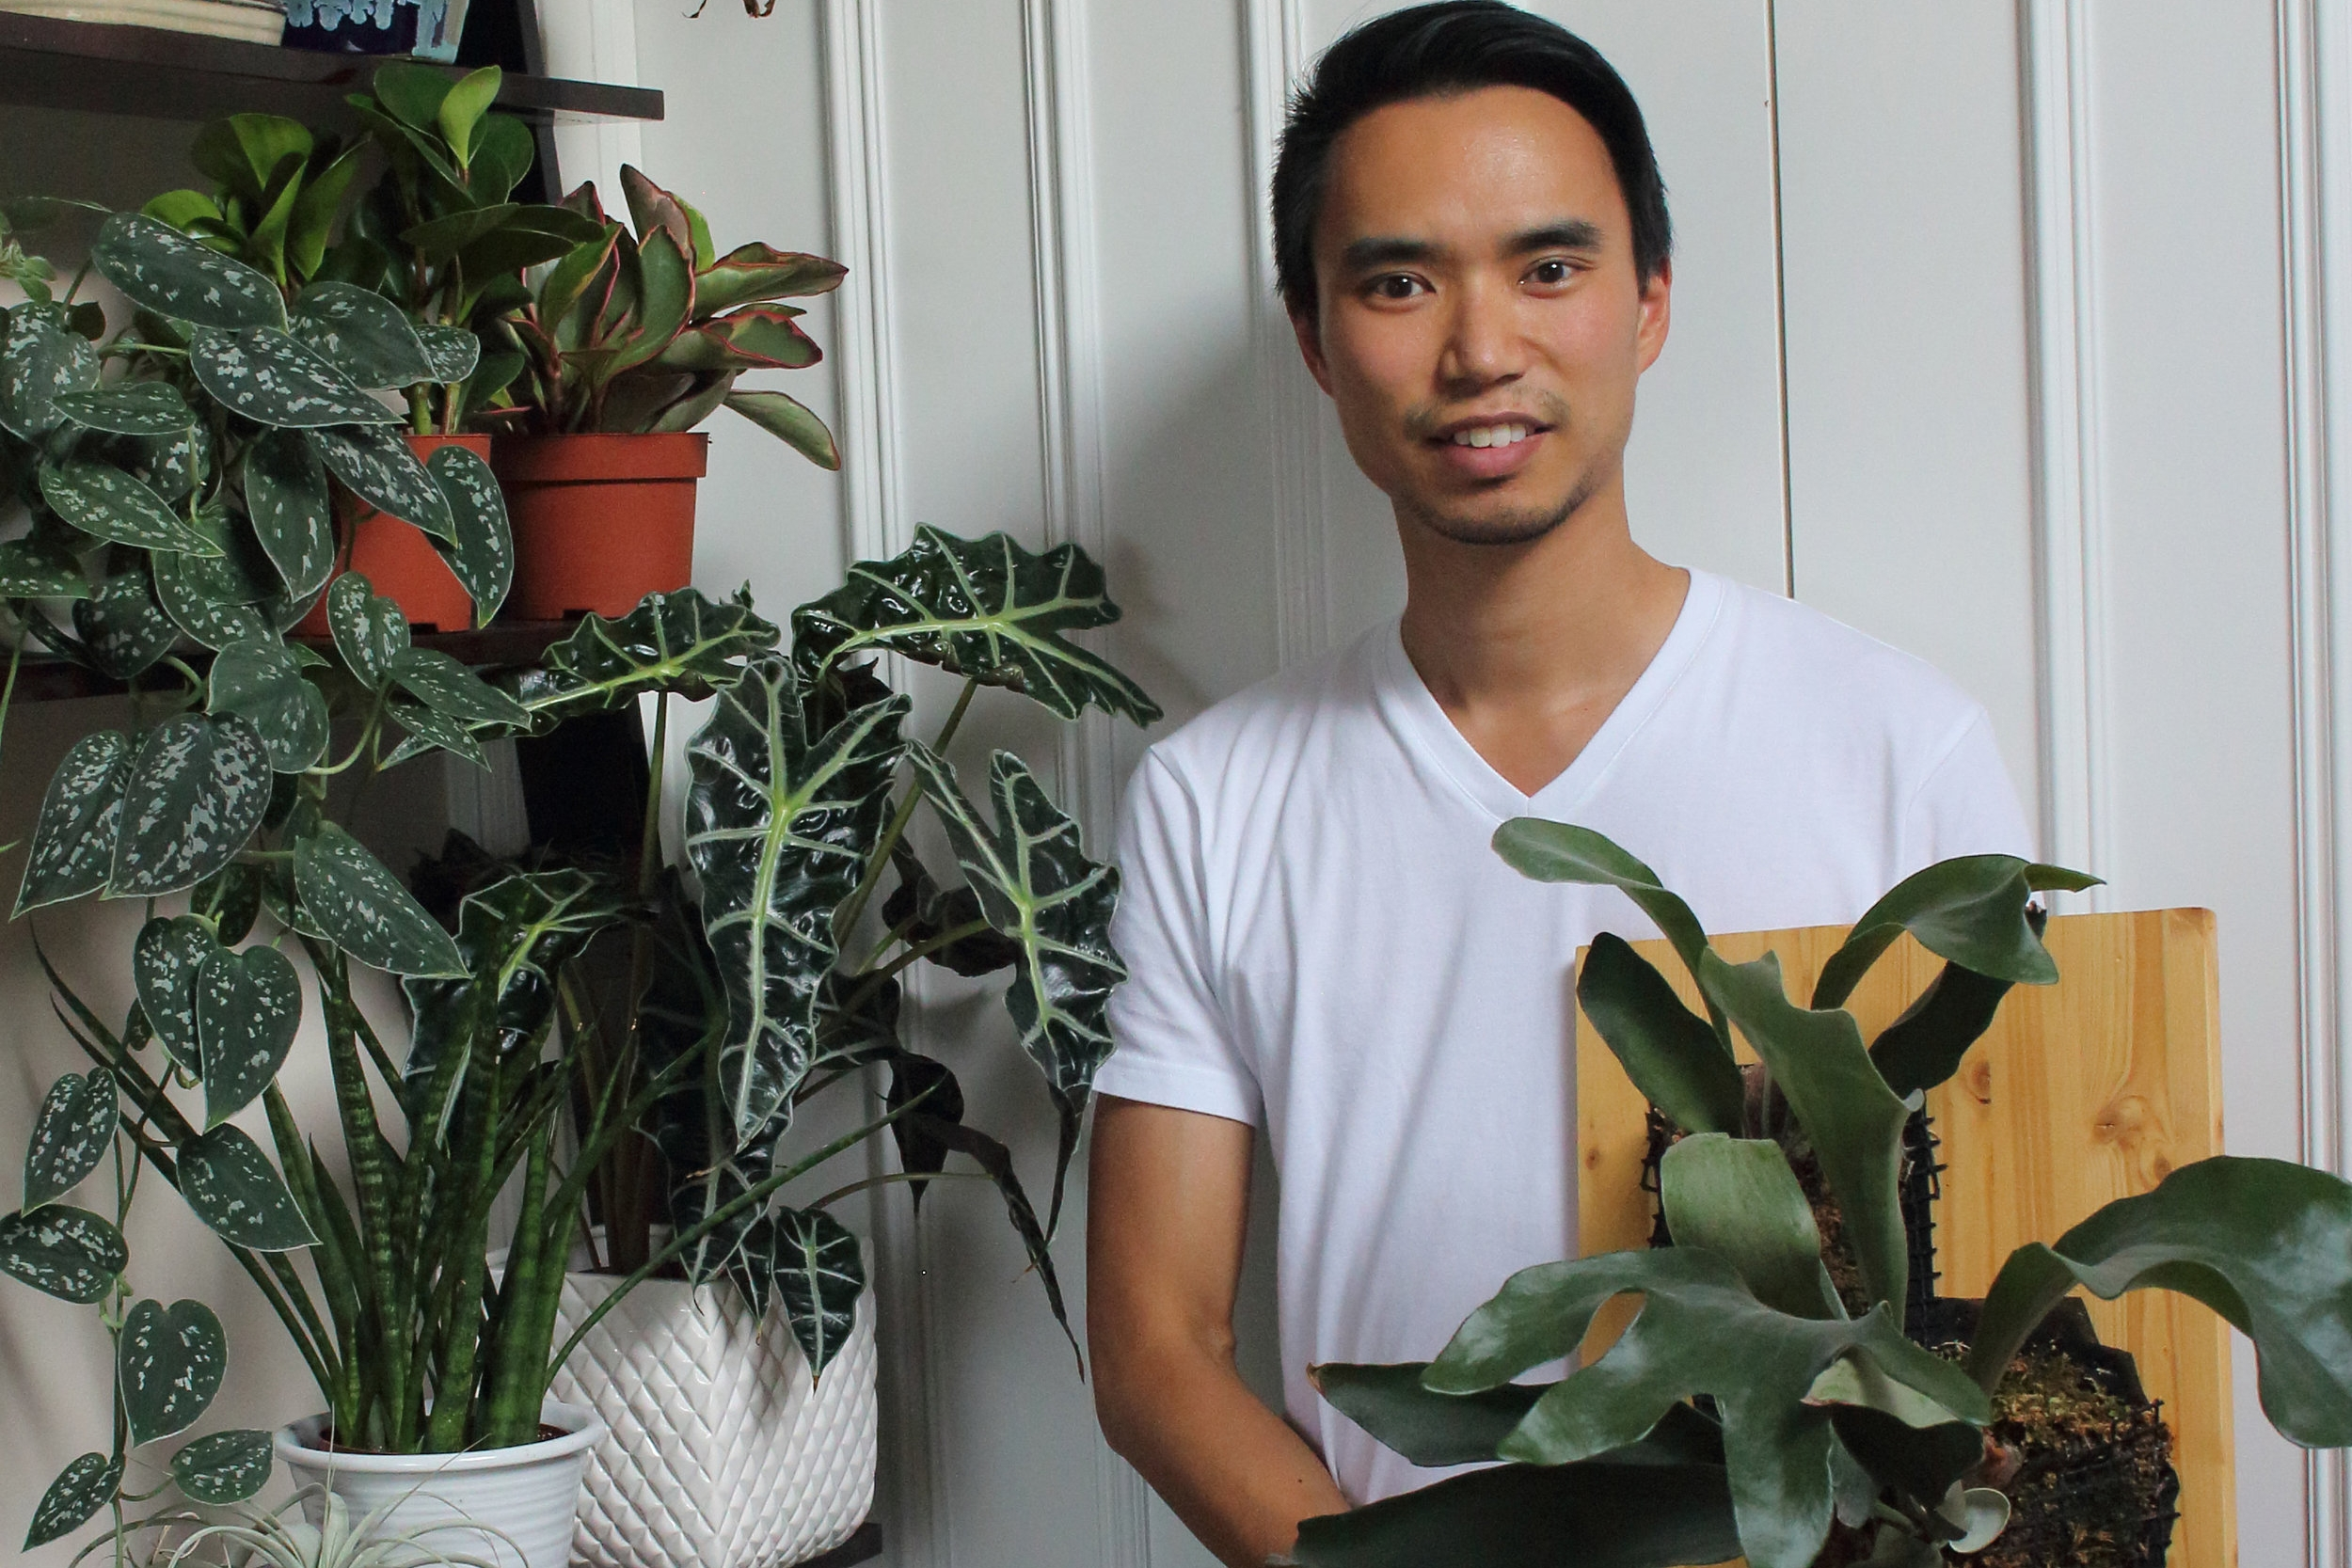 Photograph: House Plant Journal/Darryl Cheng.